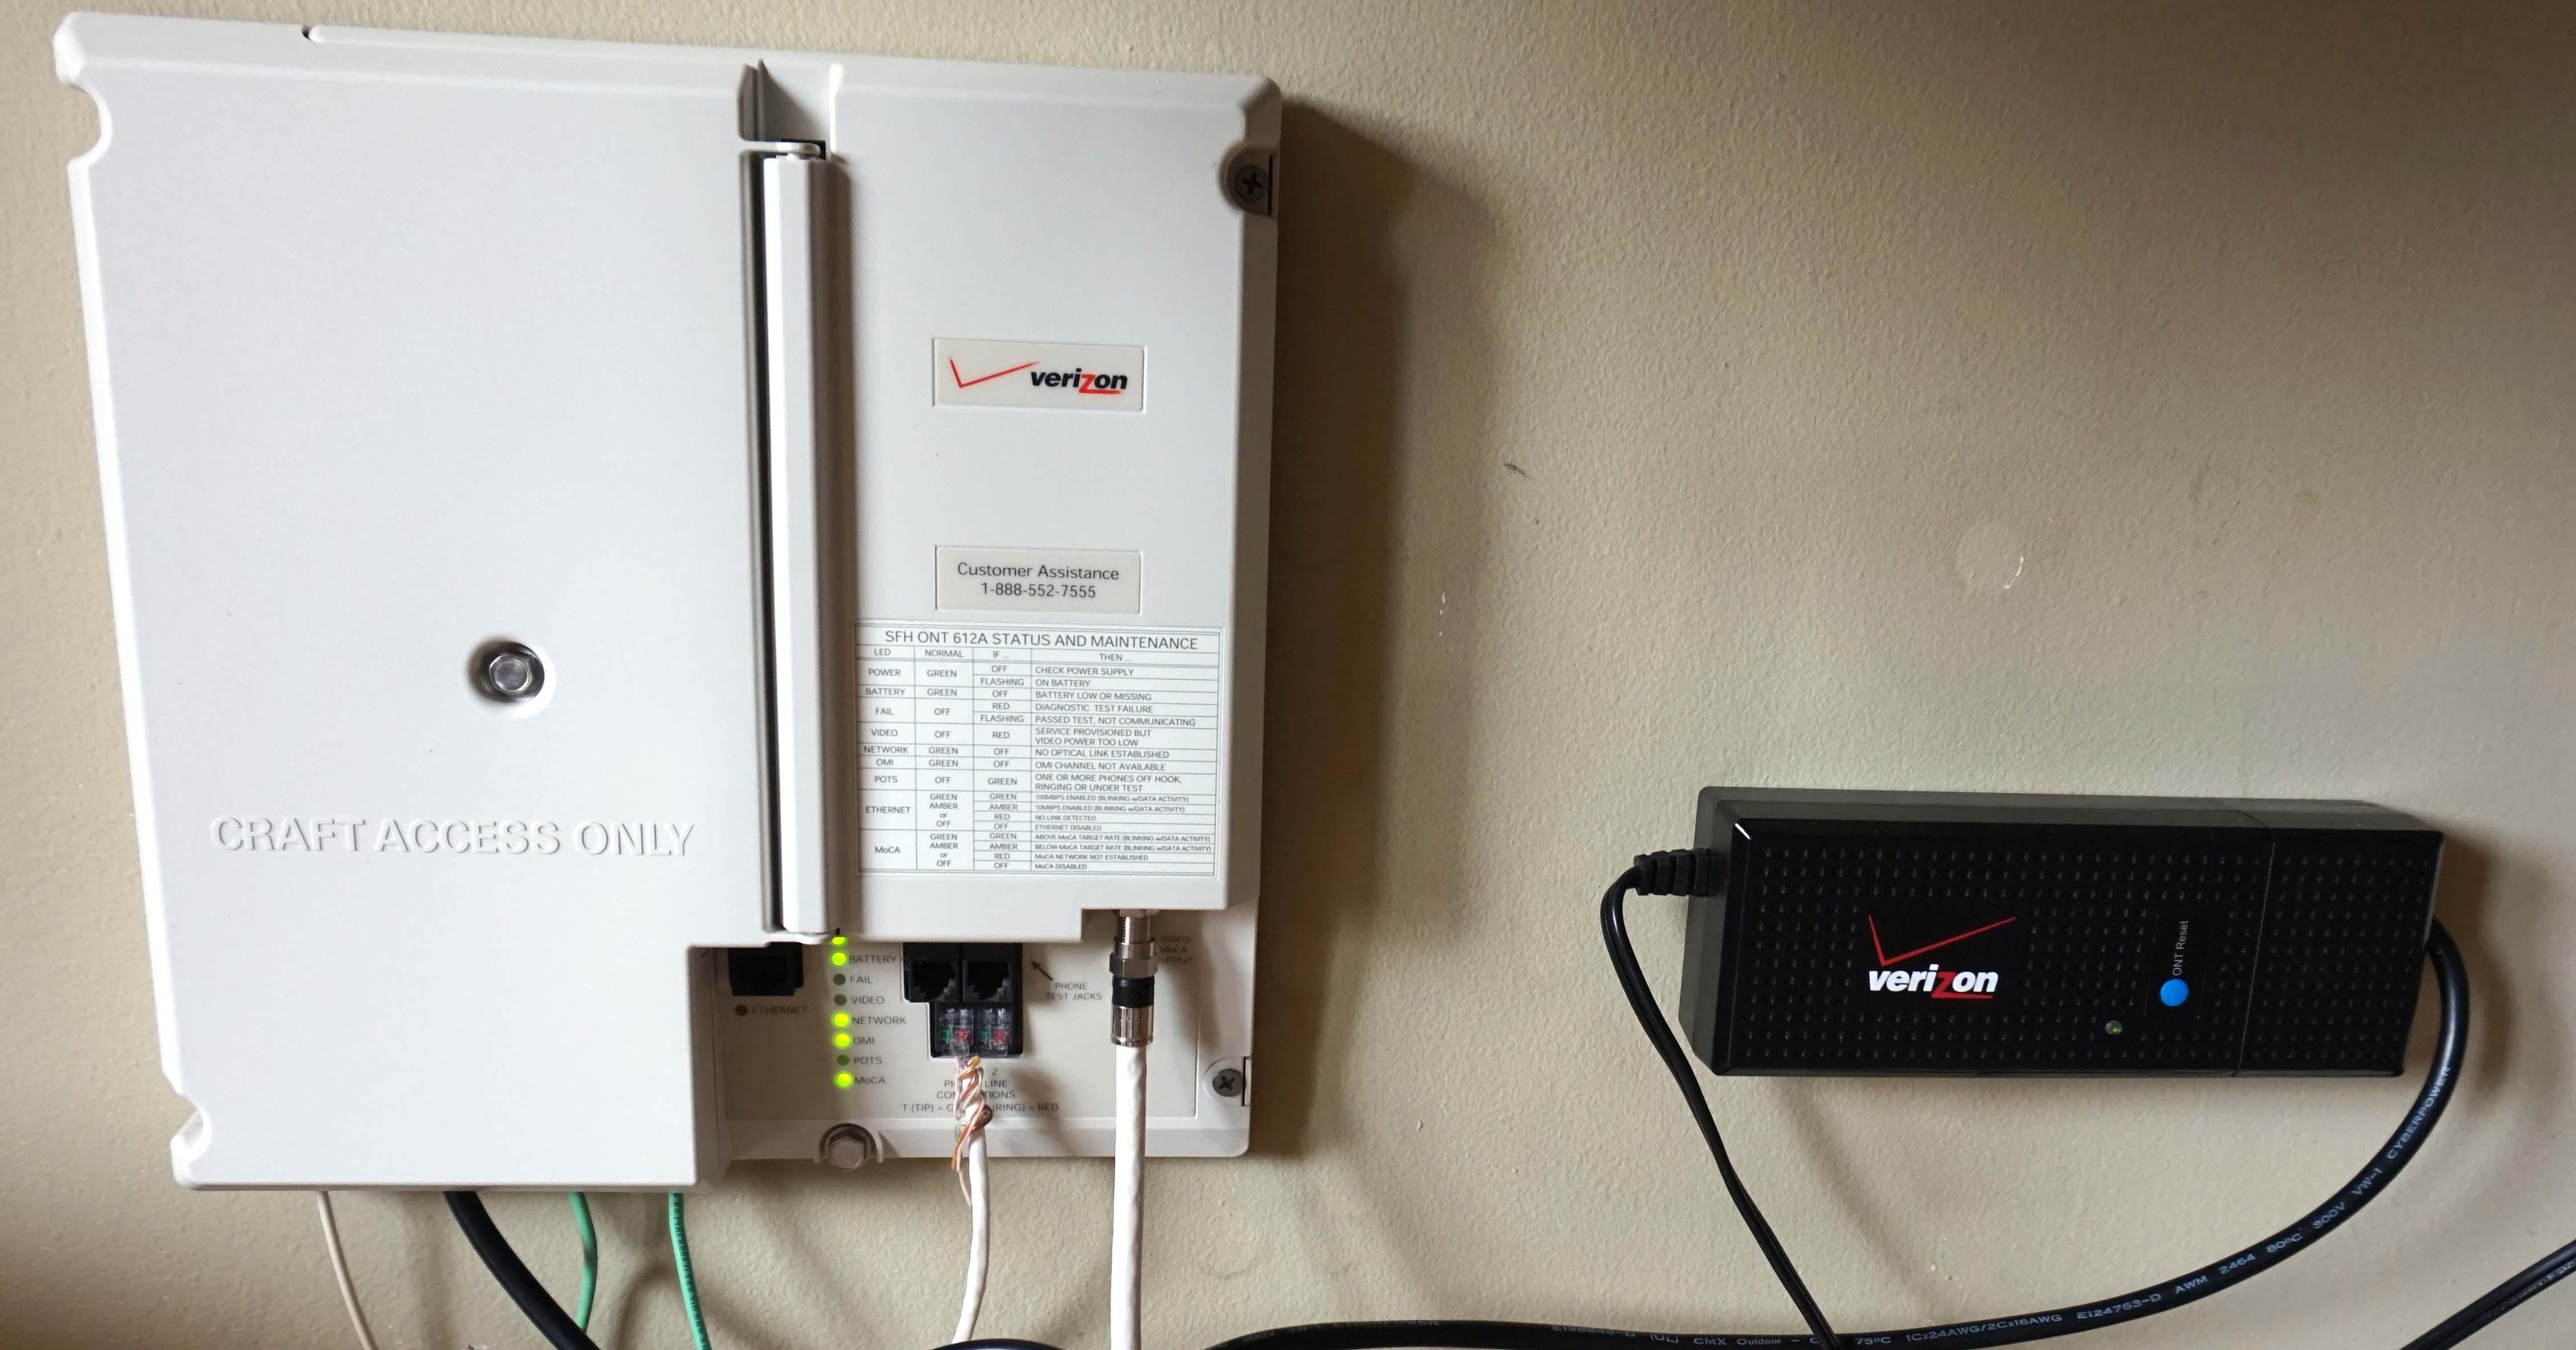 Verizon Fios wall power units